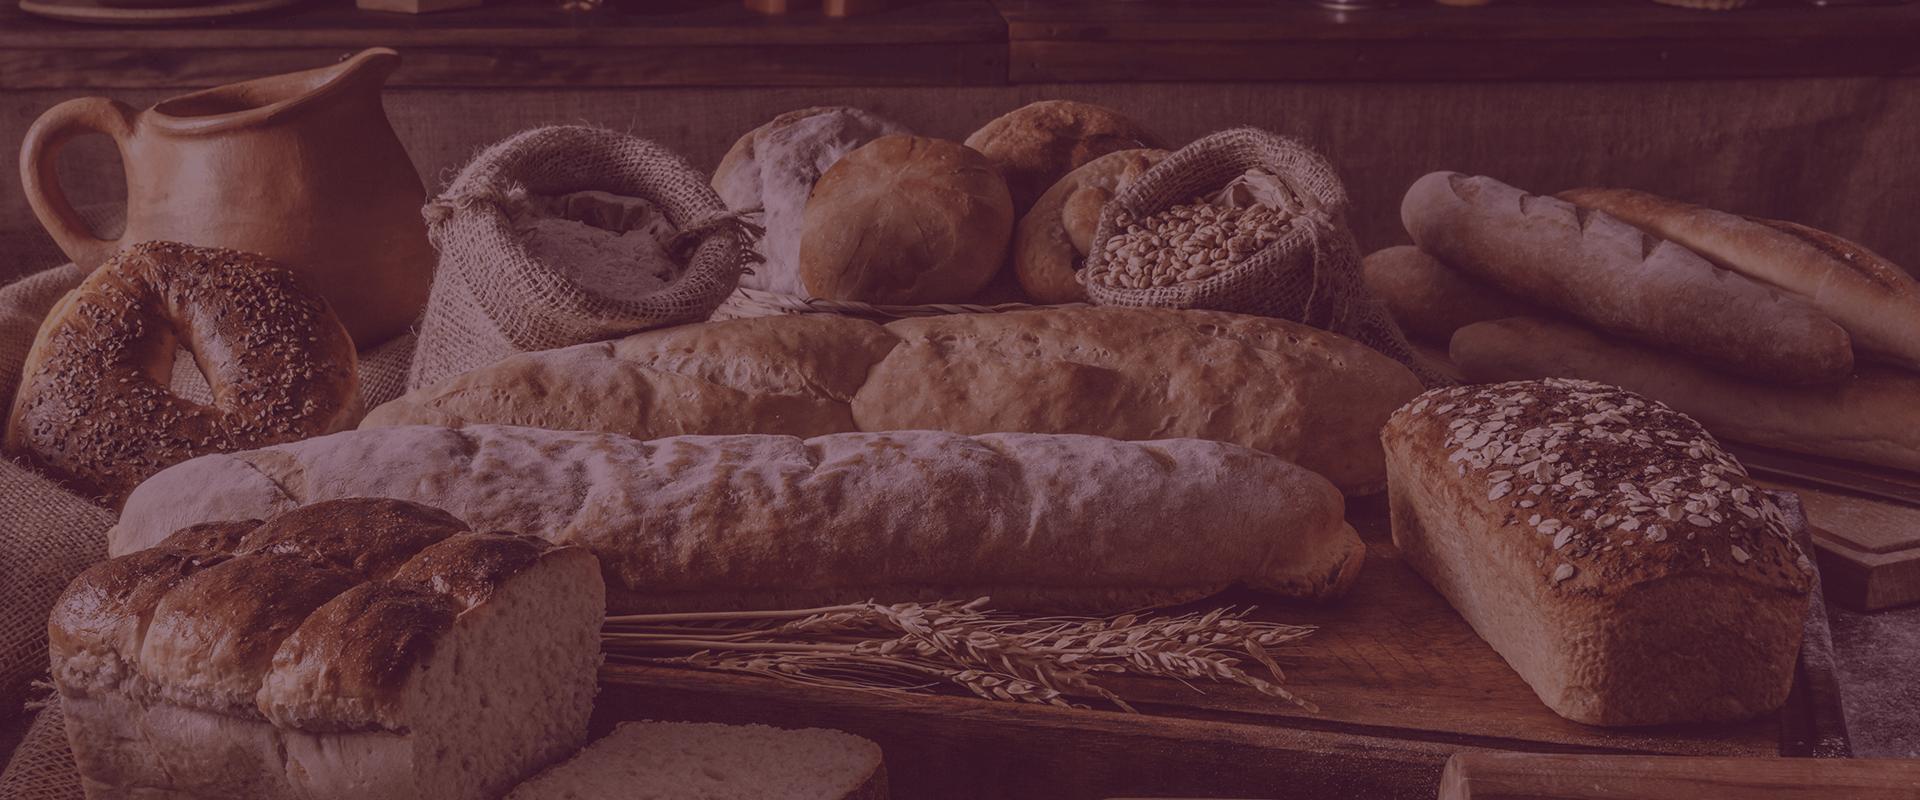 slider-boulangerie-artidelices-villers-le-gambon